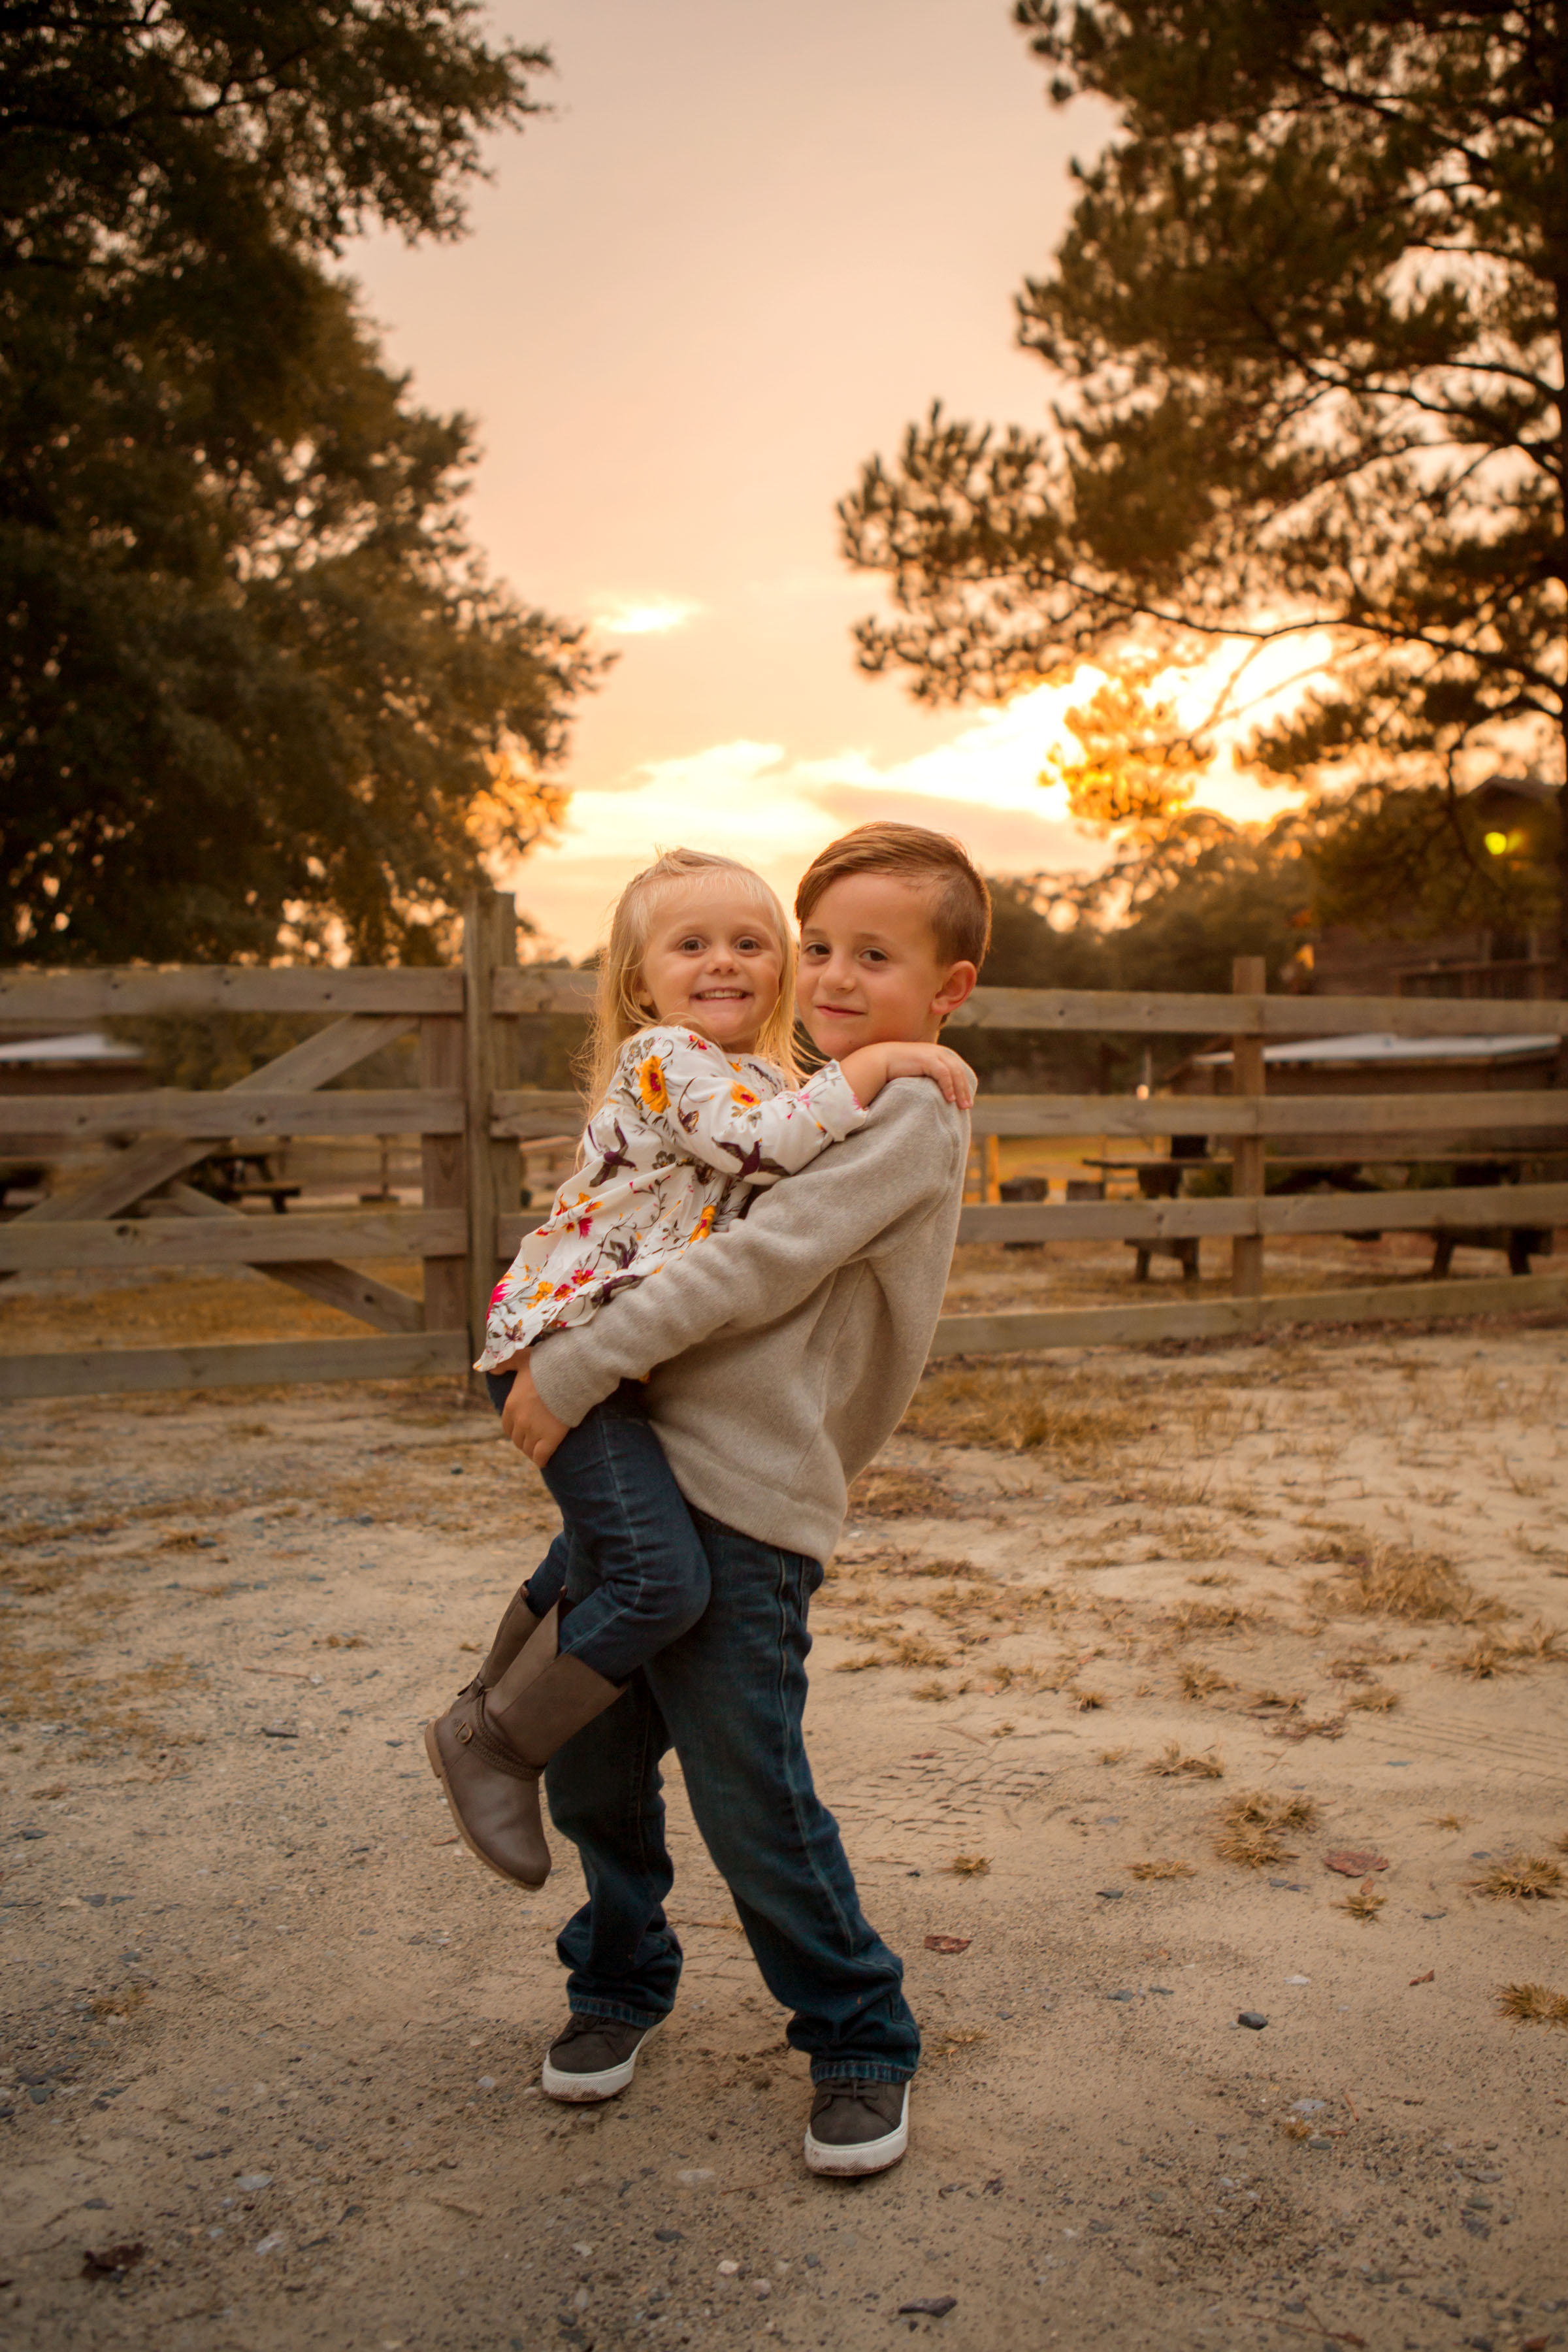 Fall-Woods-Mini-Session-Wilmington-NC-Tiffany-Abruzzo-Photography-24.jpg